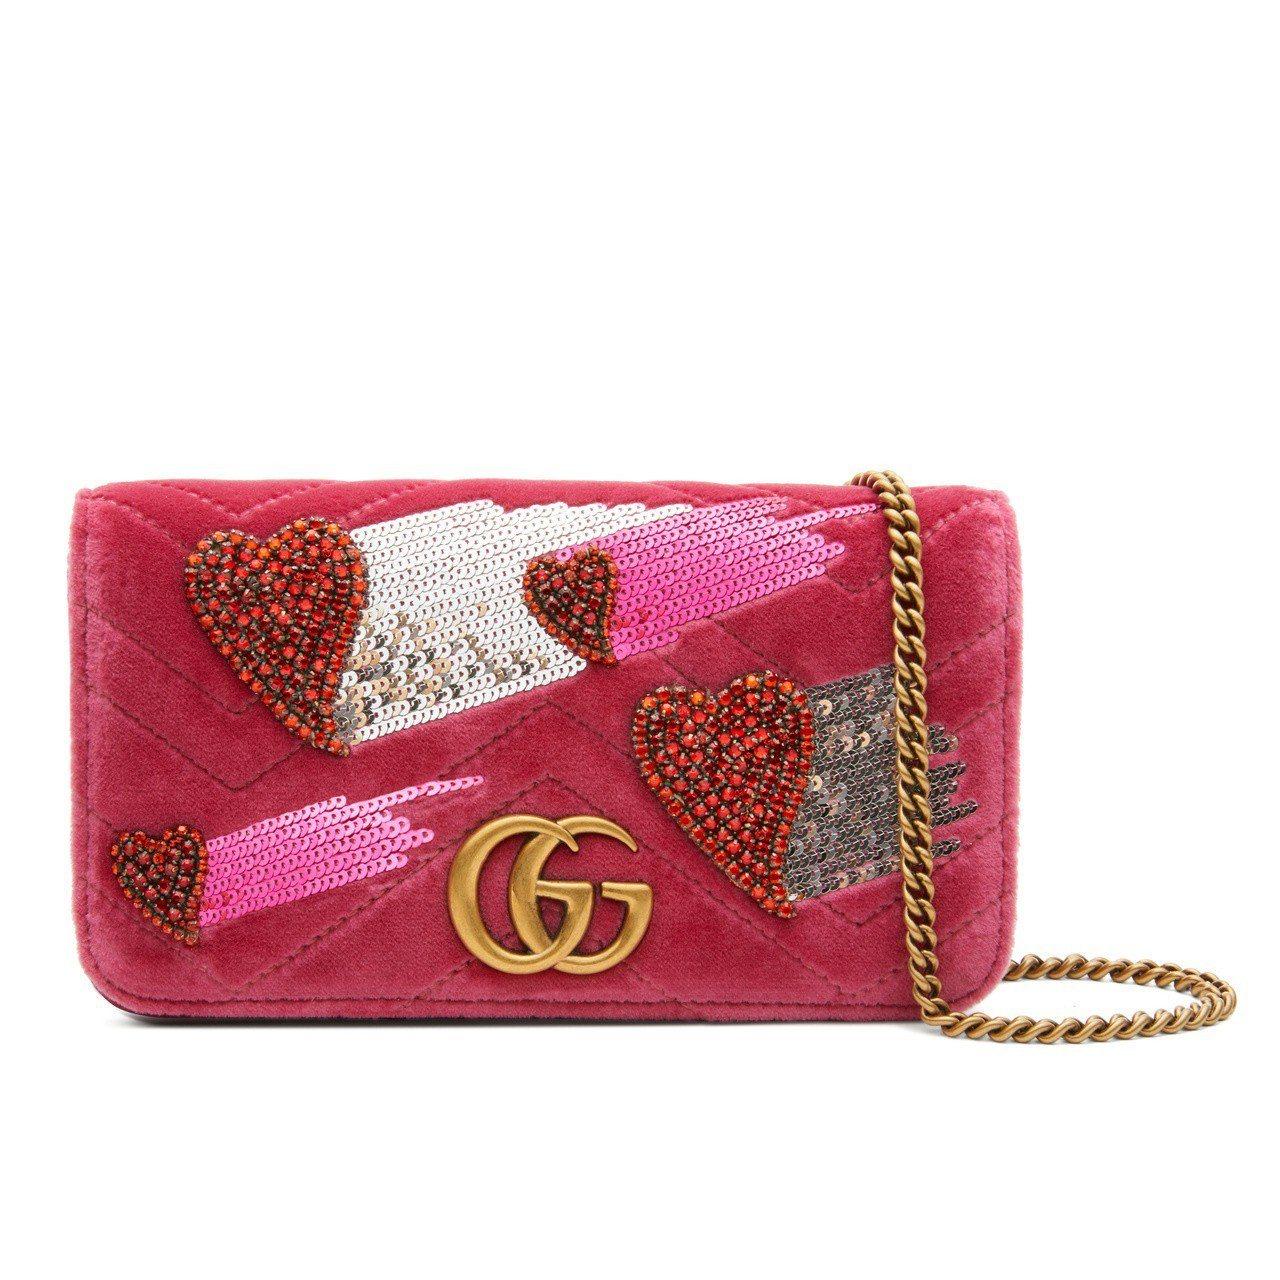 GUCCI GG Marmont桃紅水晶愛心刺繡迷你鍊帶包,售價54,500元。...